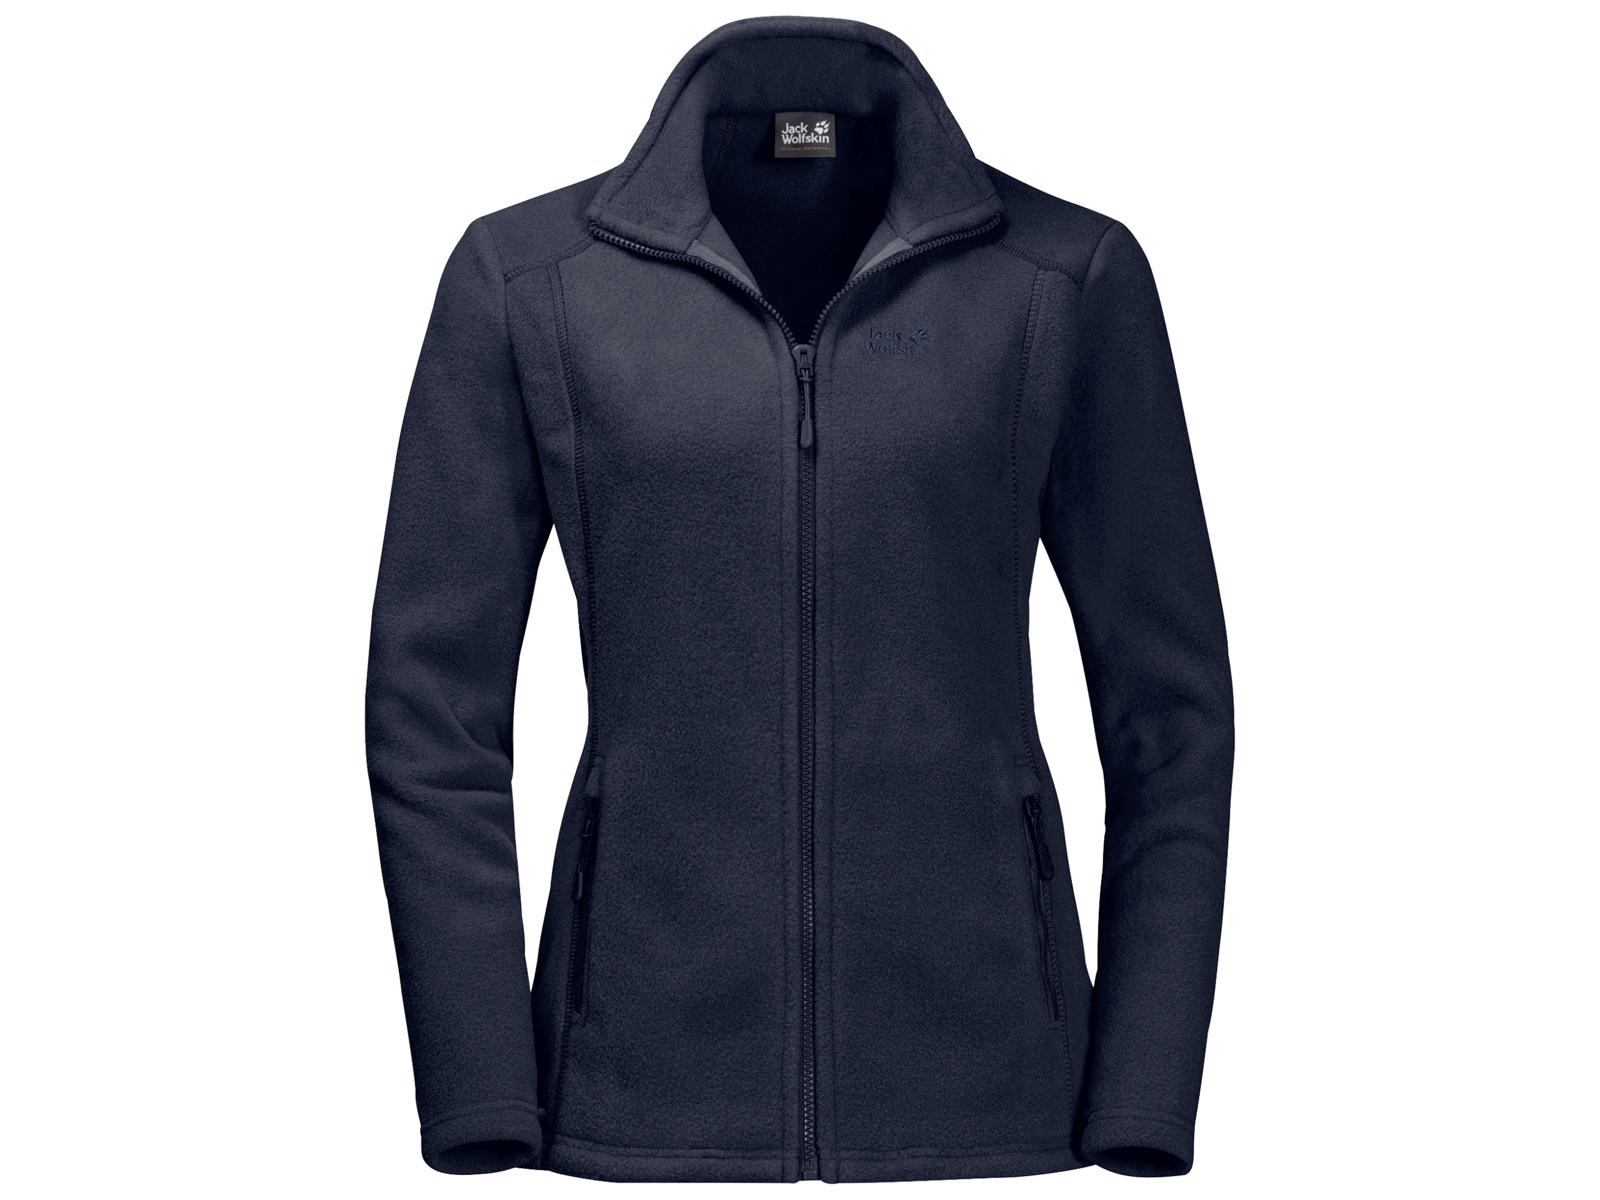 Jack Wolfskin Midnight Moon Fleece jakke Dame Mørkeblå (DKK 399,00)